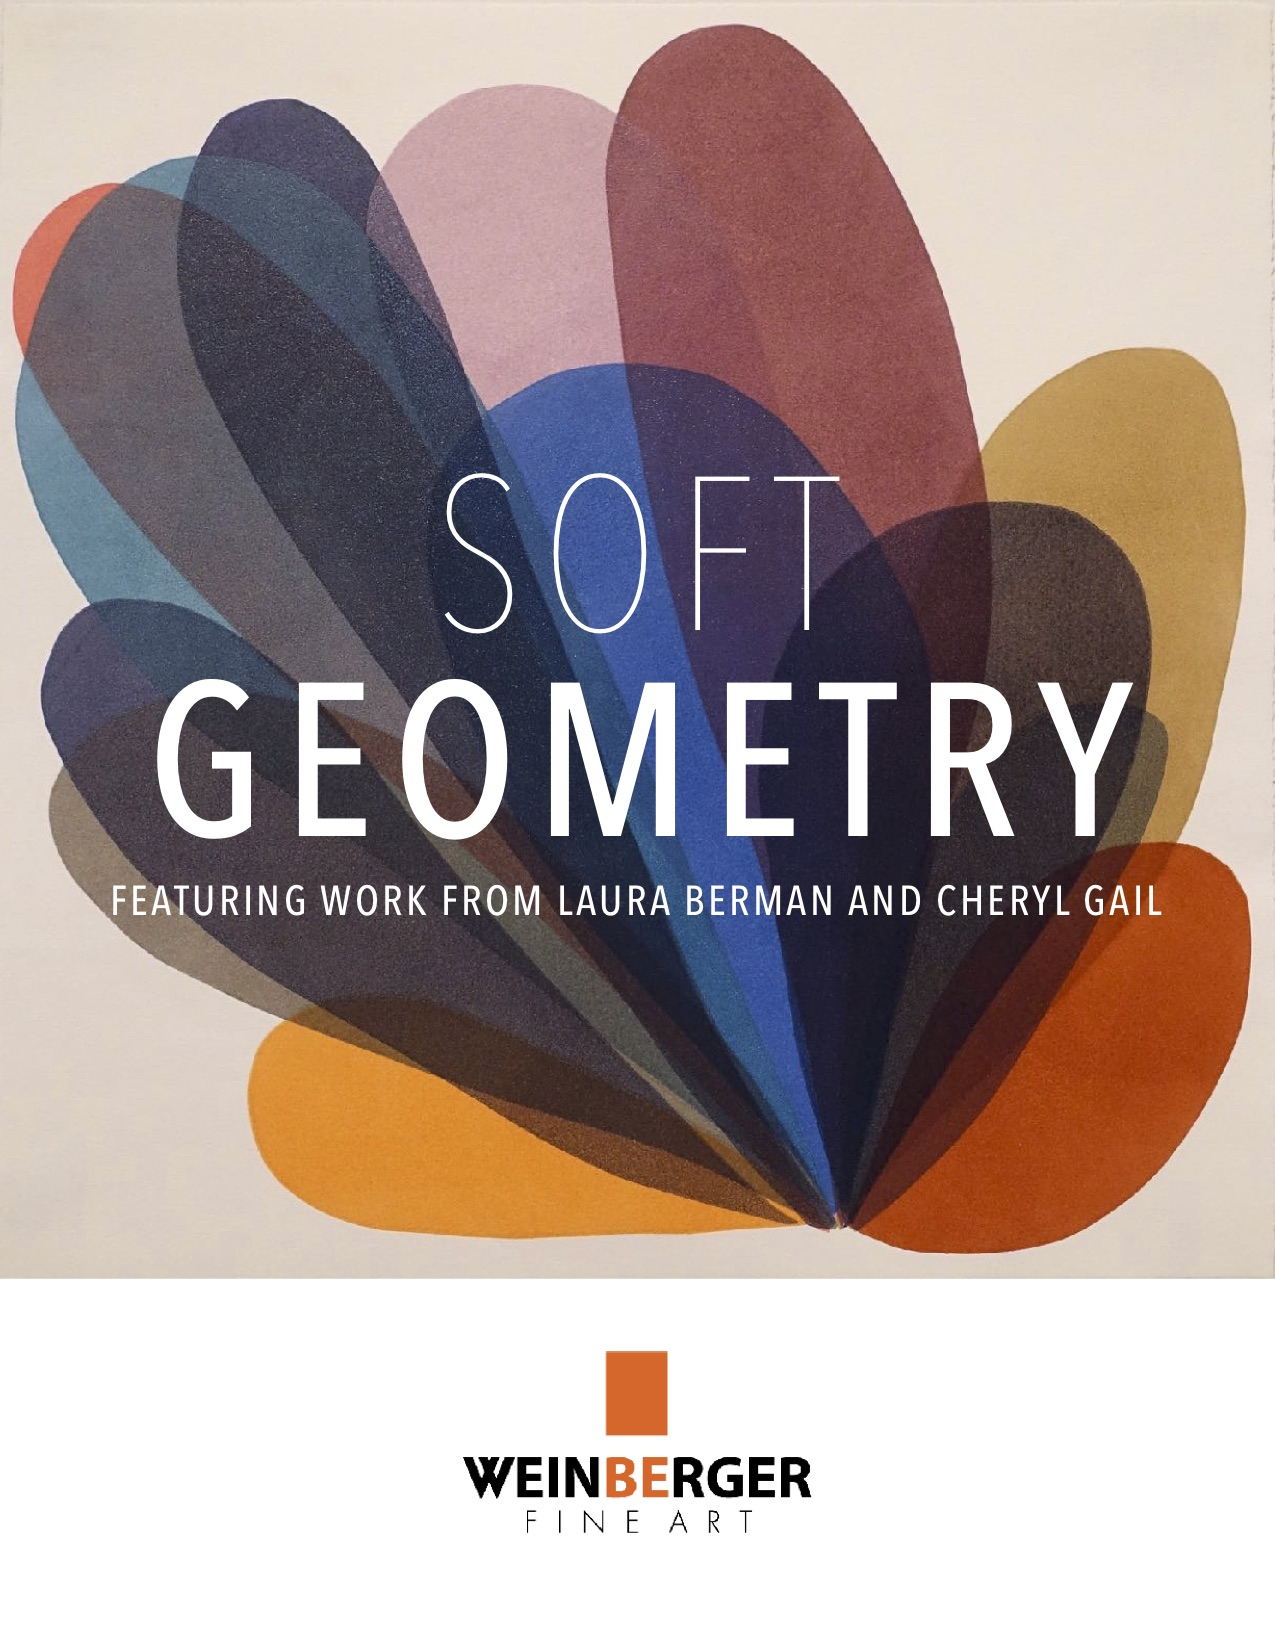 Soft Geometry